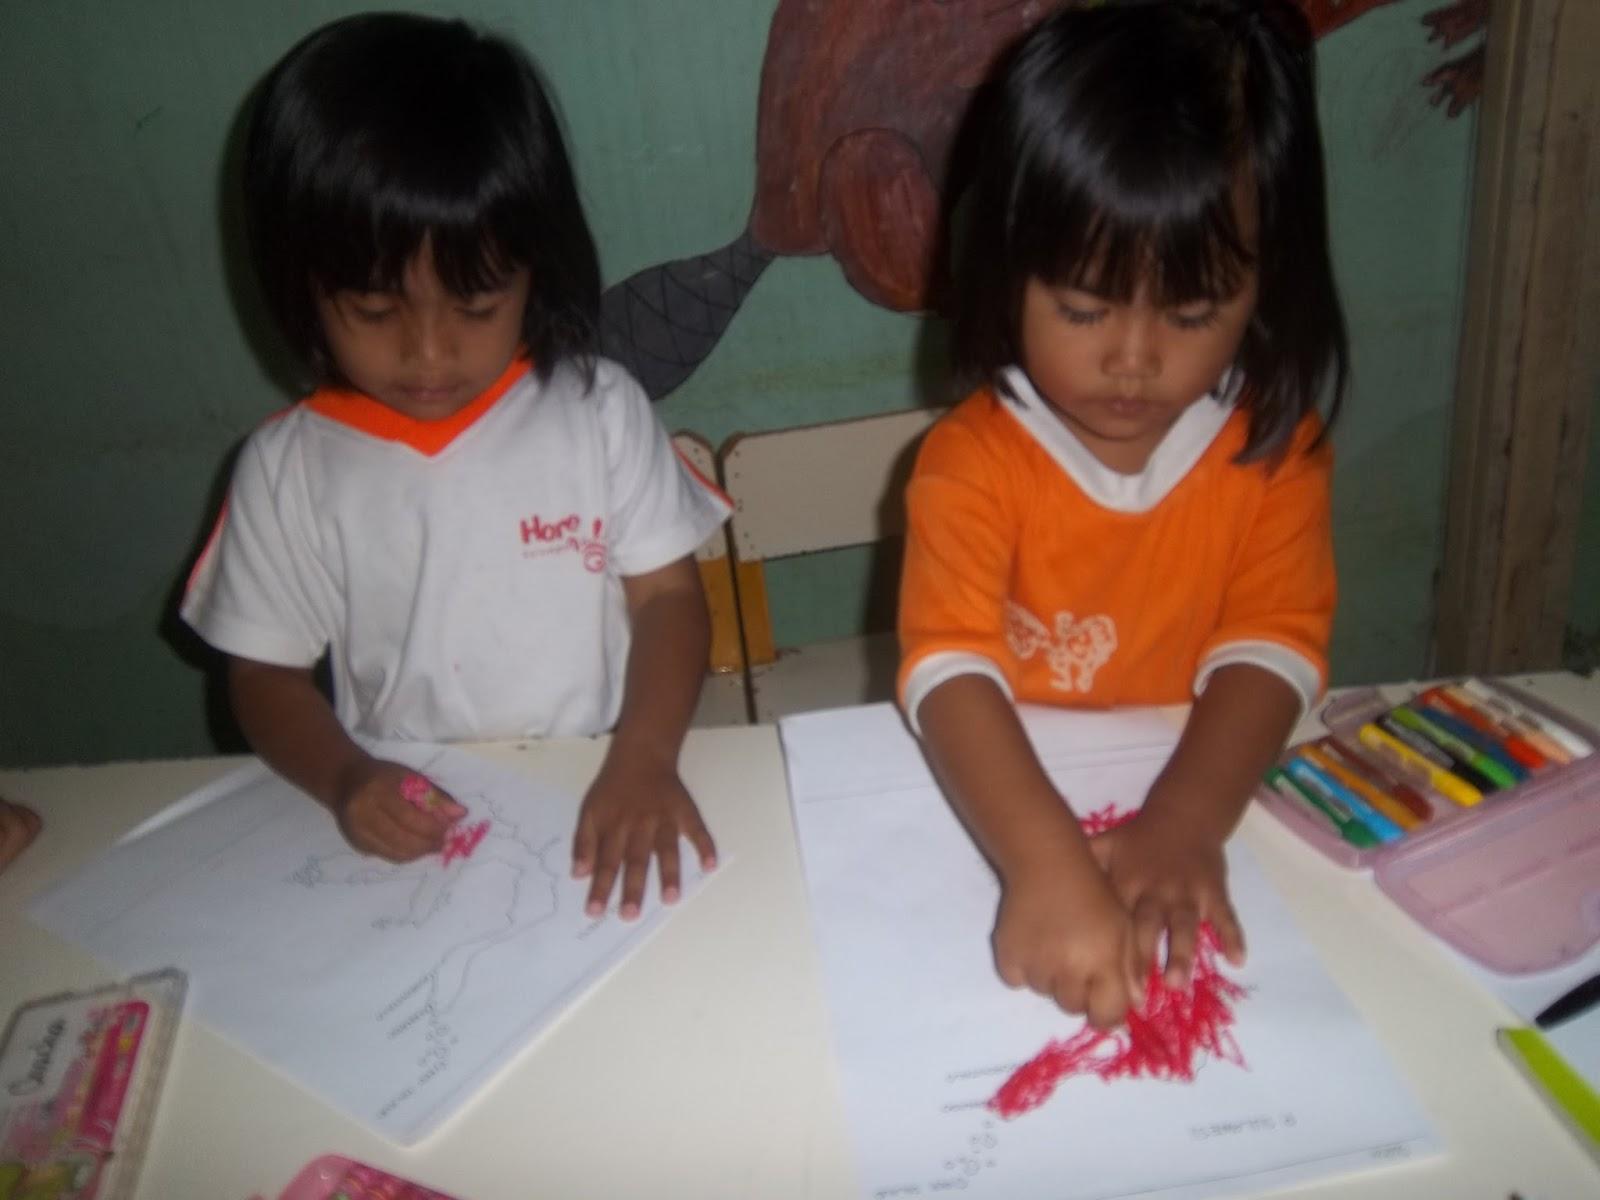 mewarnai atau mencoret coreti gambar pulau Sulawesi itu Ada juga teman kami yang mengambil crayon berwarna lain seperti warna kuning atau cokelat